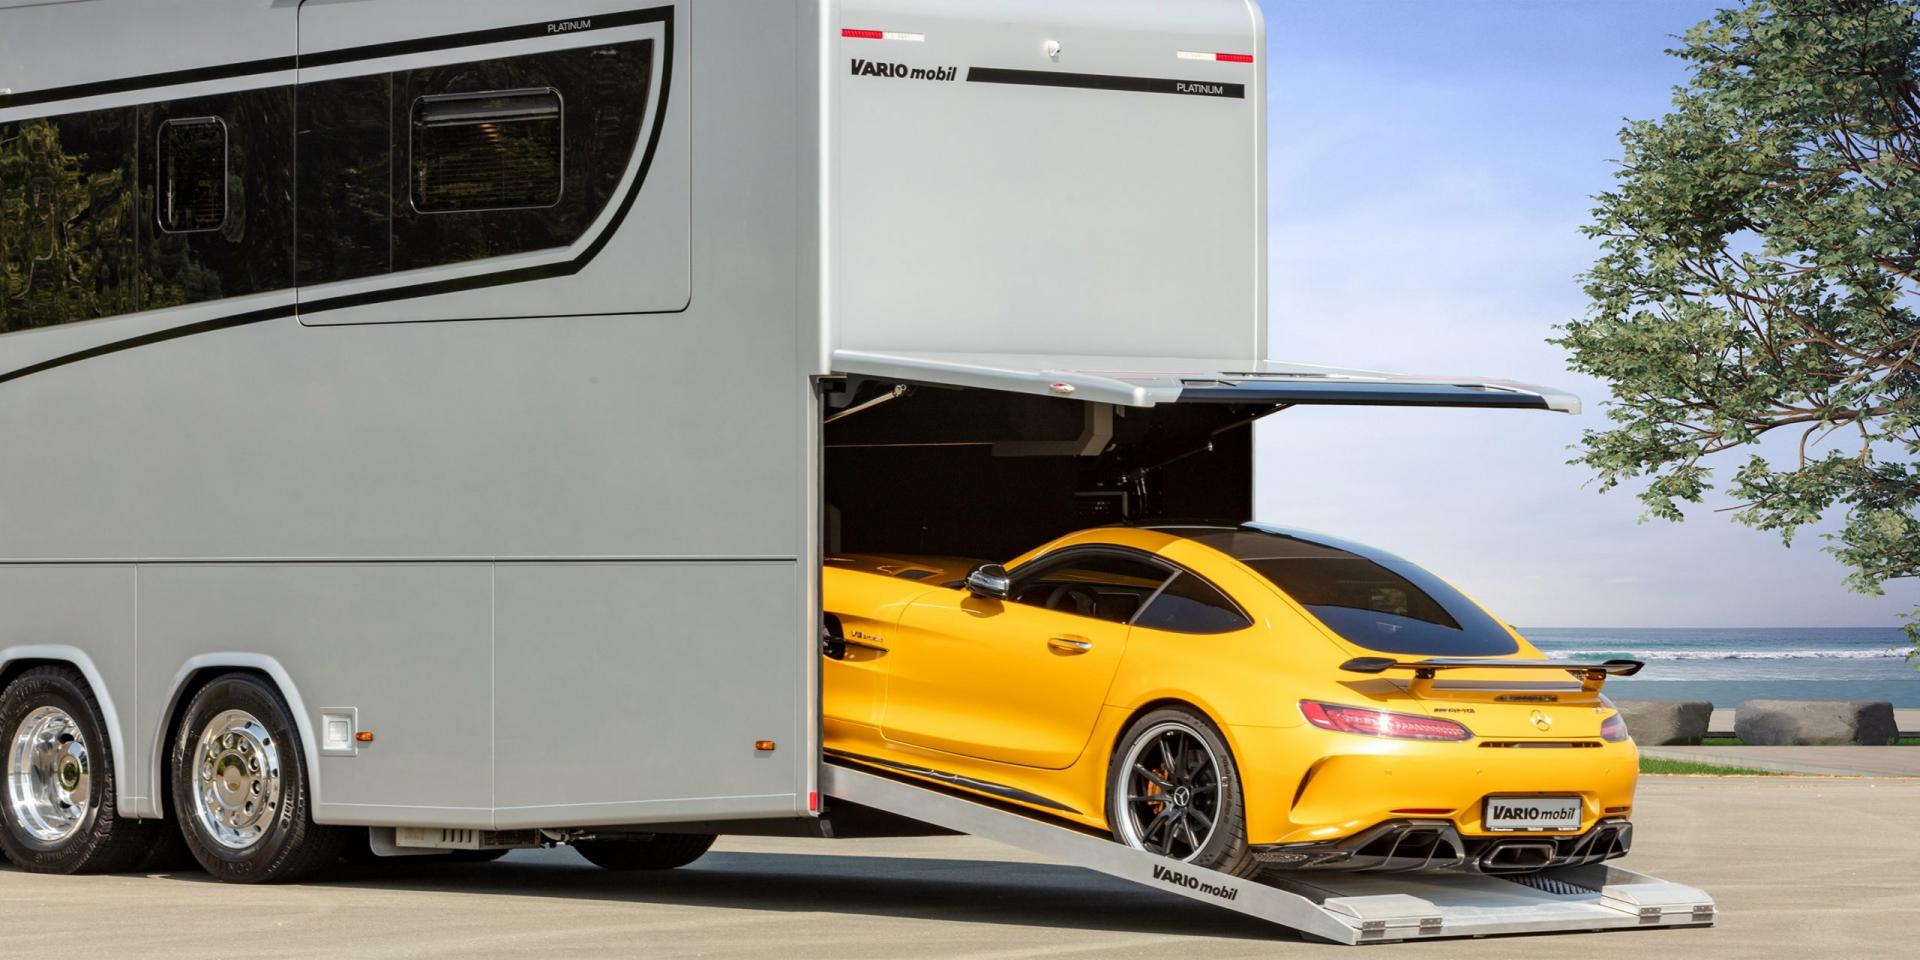 porsche 911 parkeert in camper